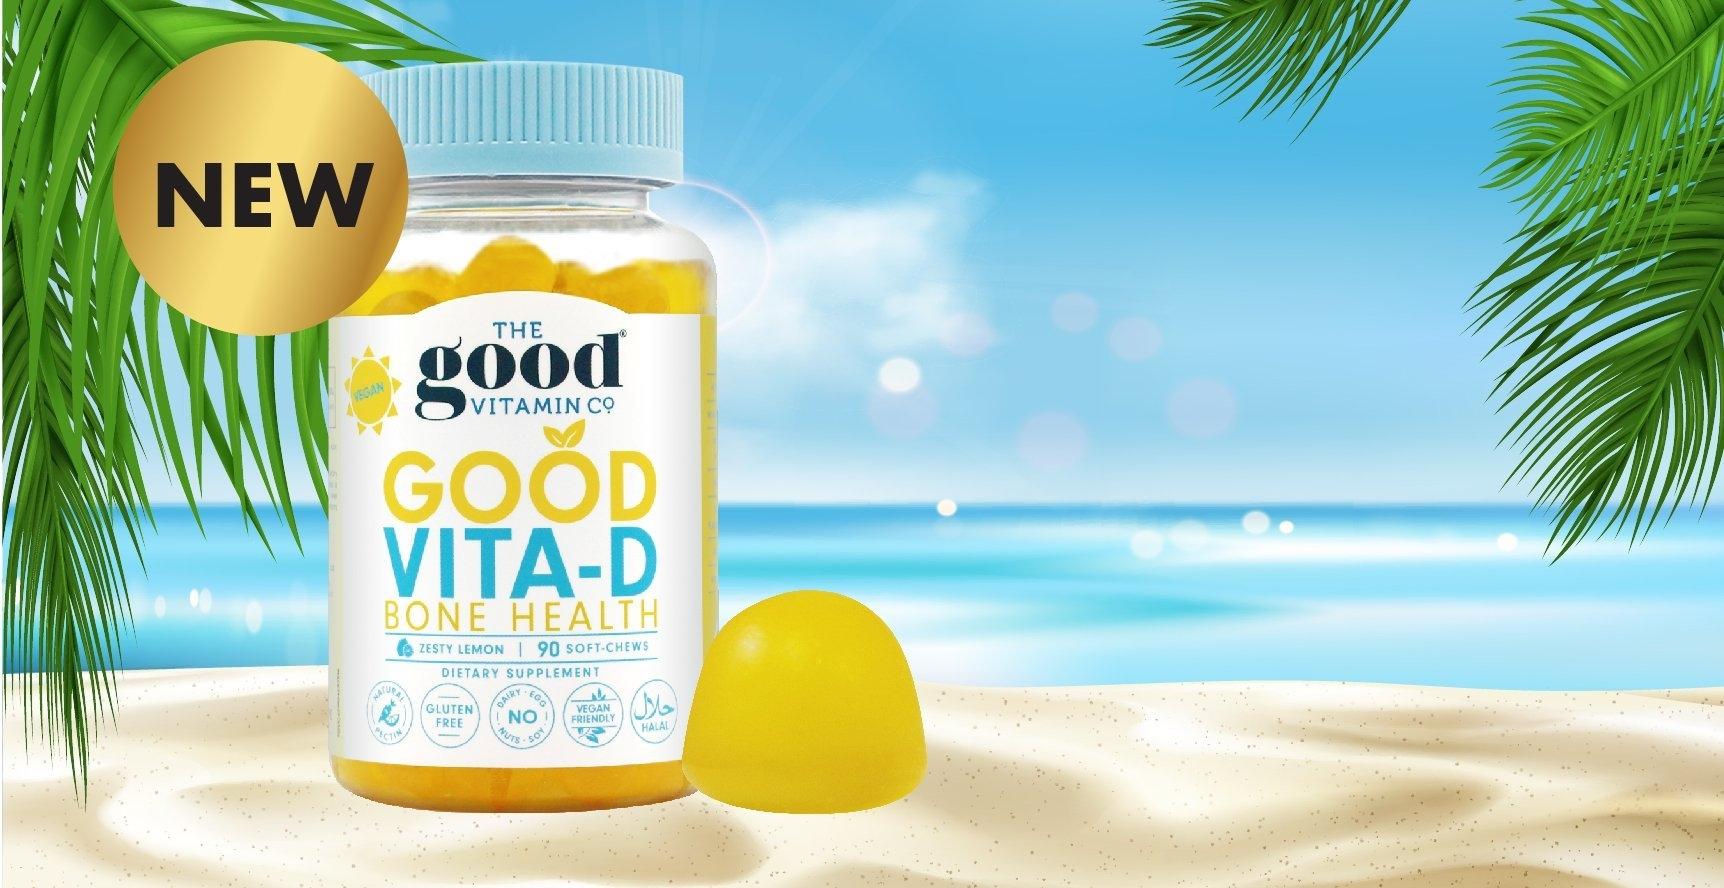 thegoodvitaminco (@thegoodvitaminco) Cover Image